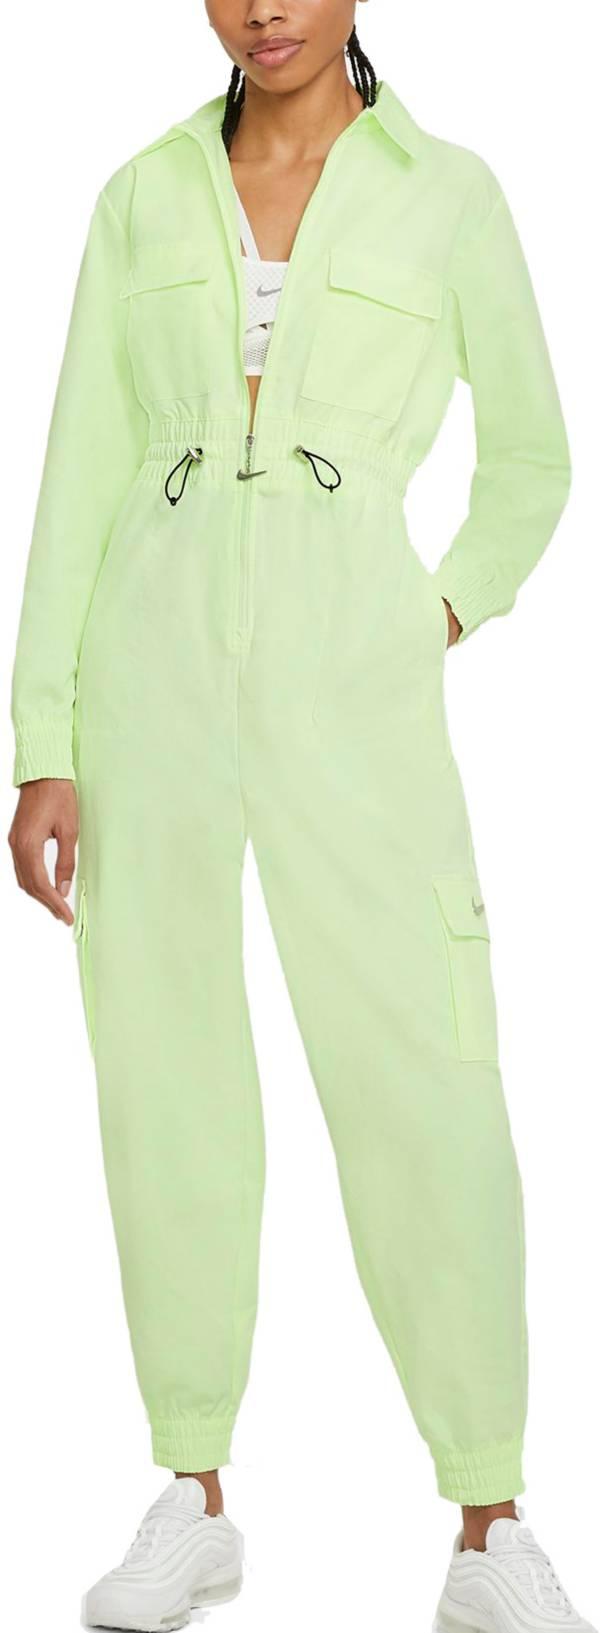 Nike Women's Swoosh Woven Jumpsuit product image